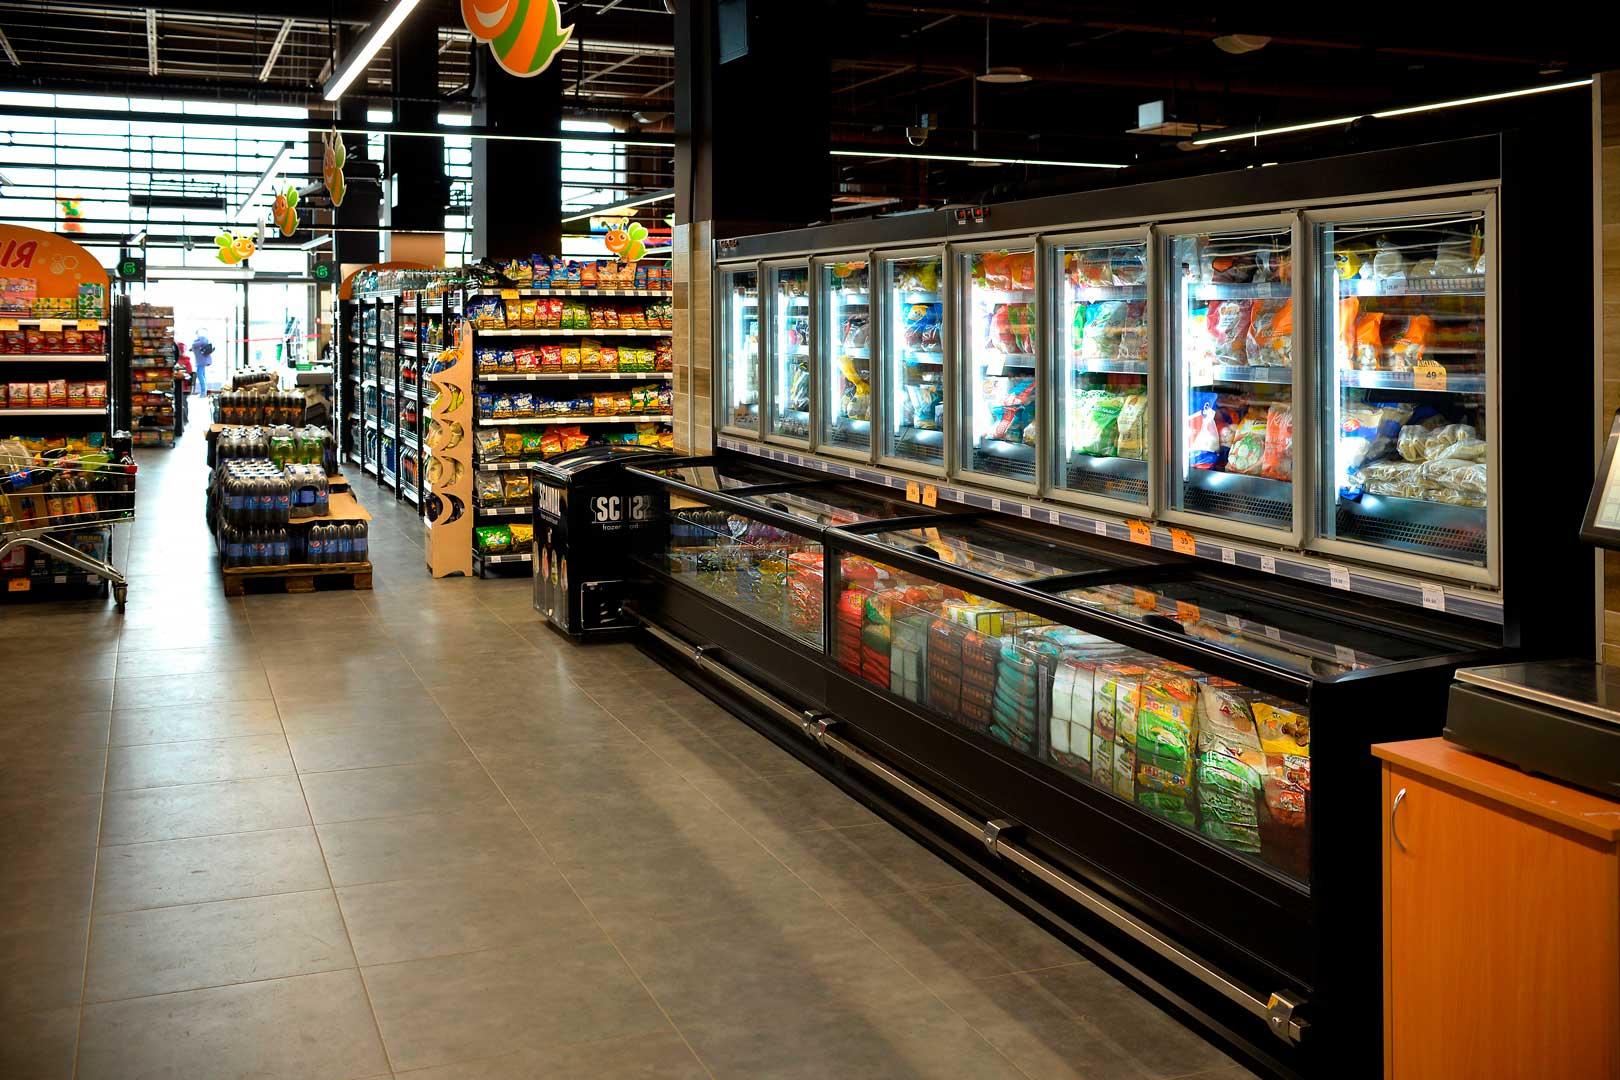 Combined refrigerated counters Alaska combi 2 MD MHV 110 LT D/C 200-DLM